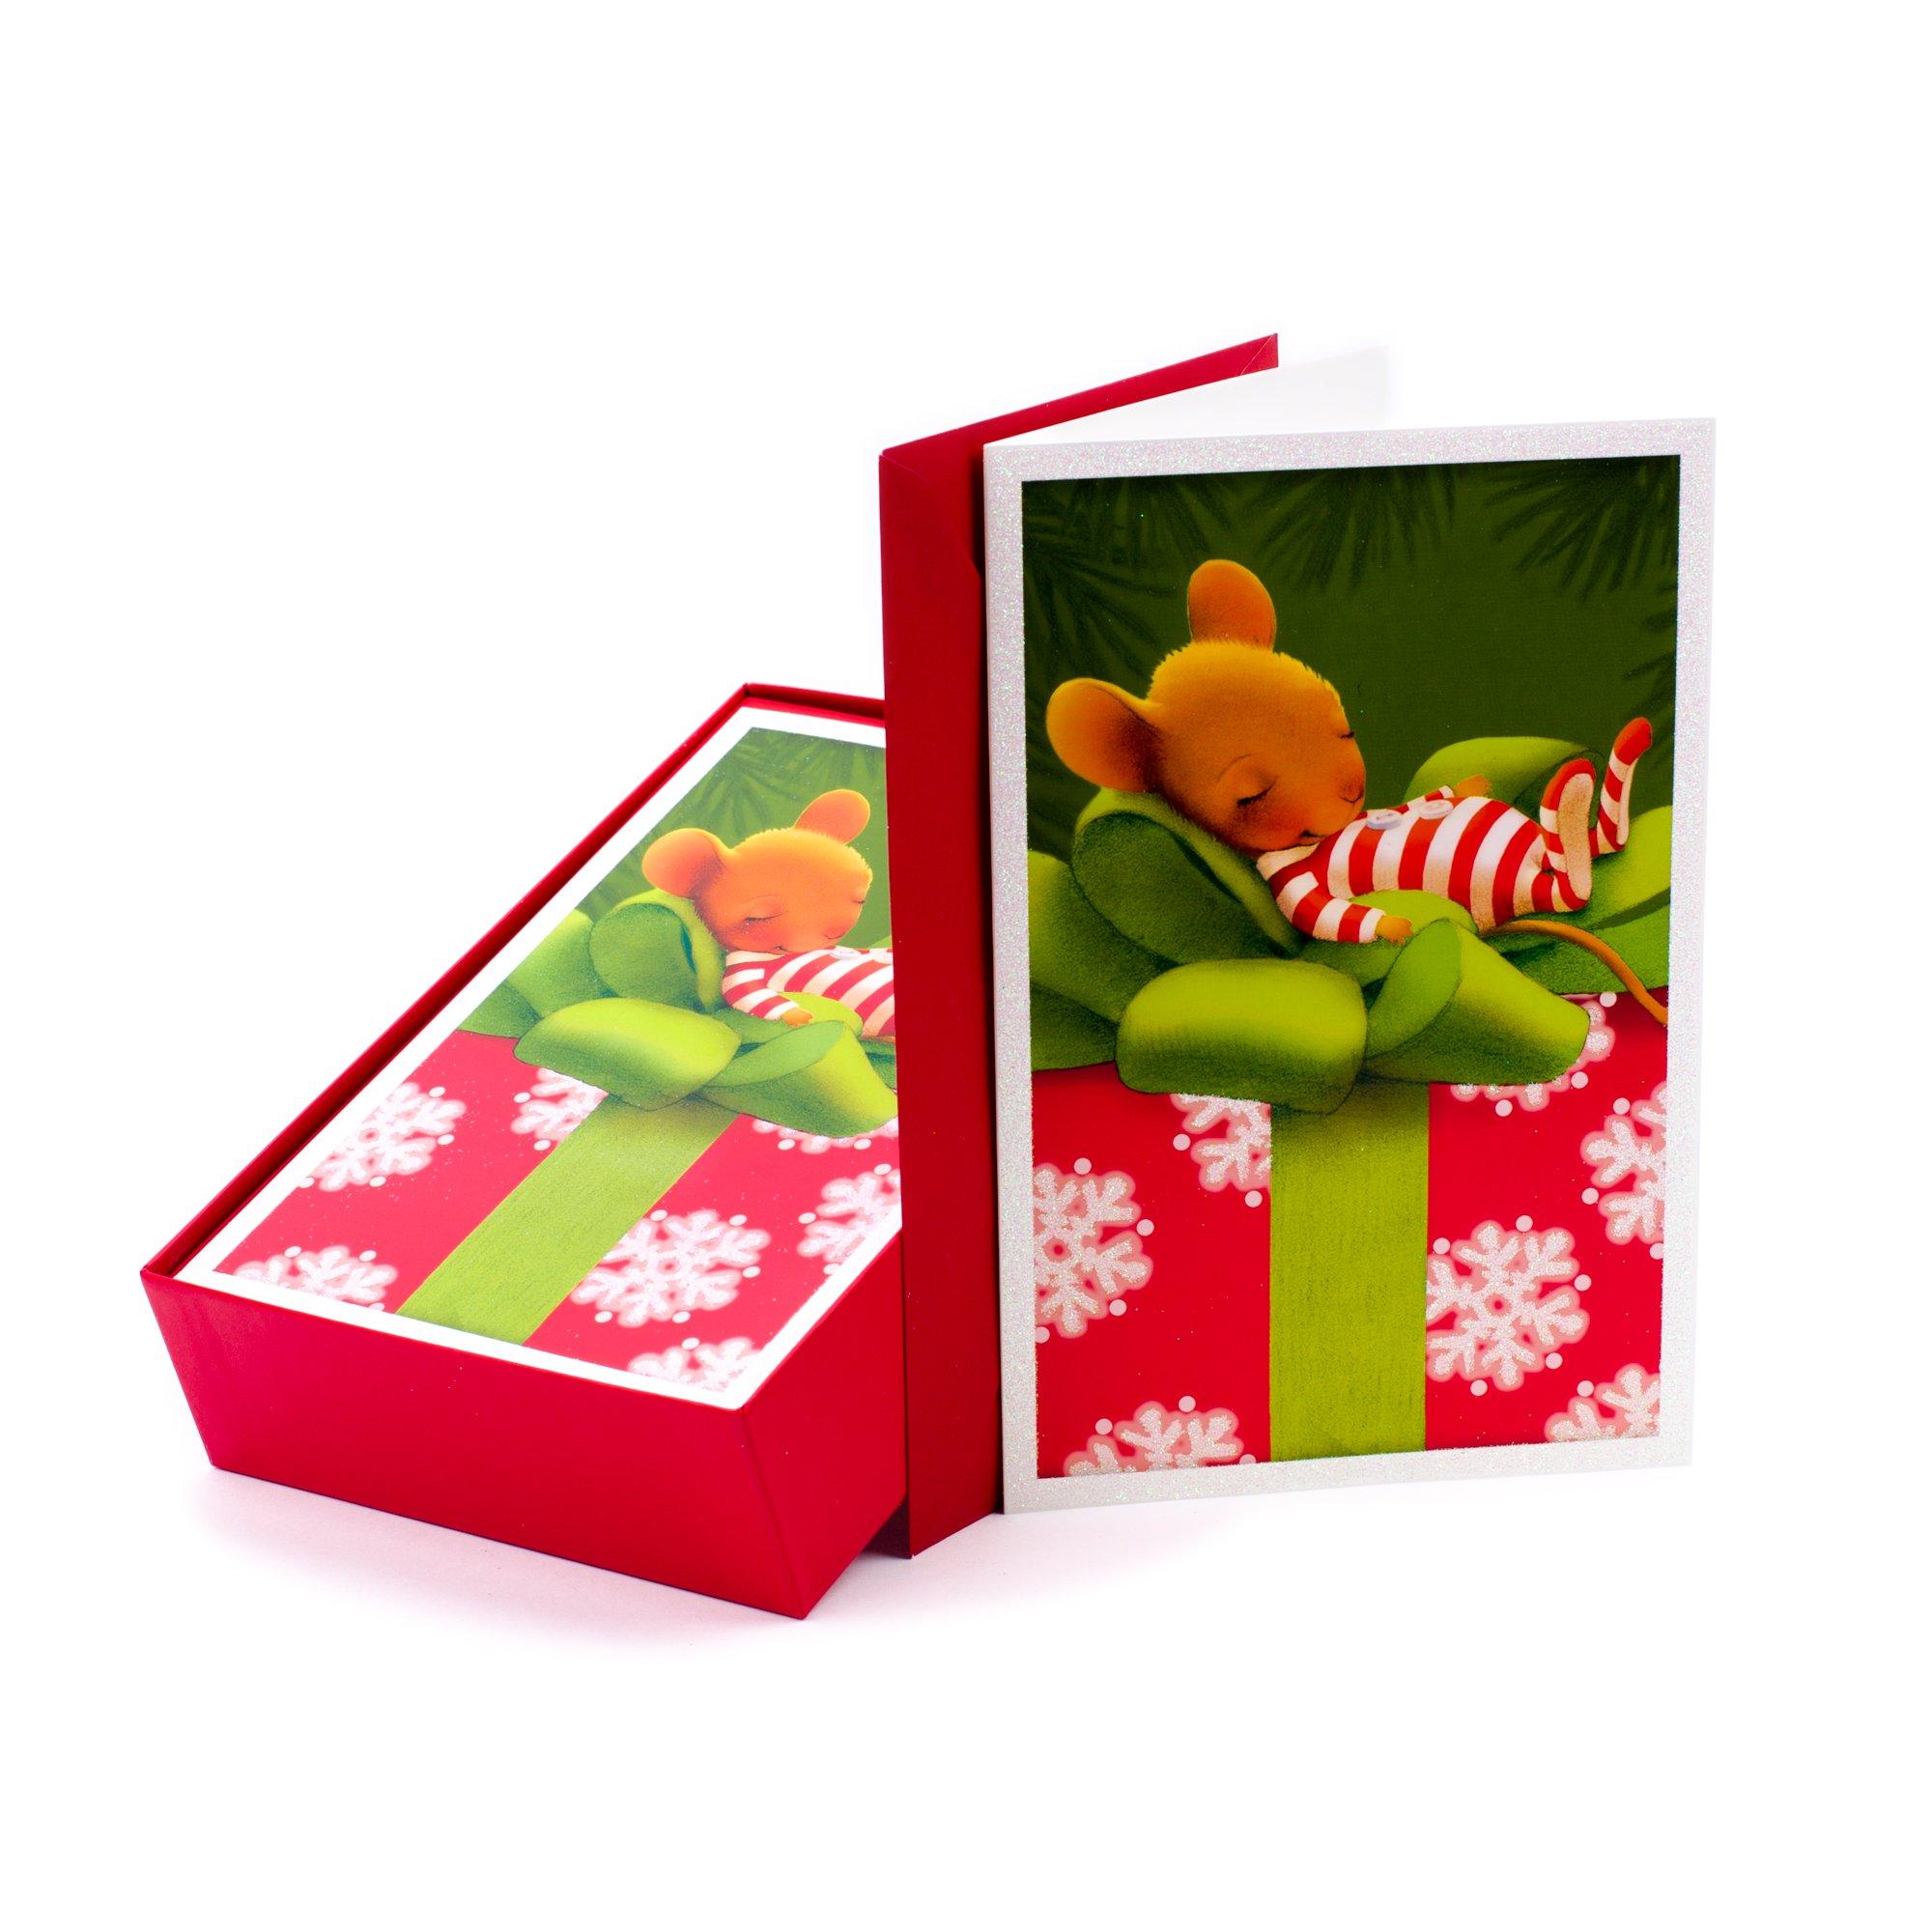 Amazon.com: Hallmark Christmas Boxed Cards, Holiday Holly (40 ...